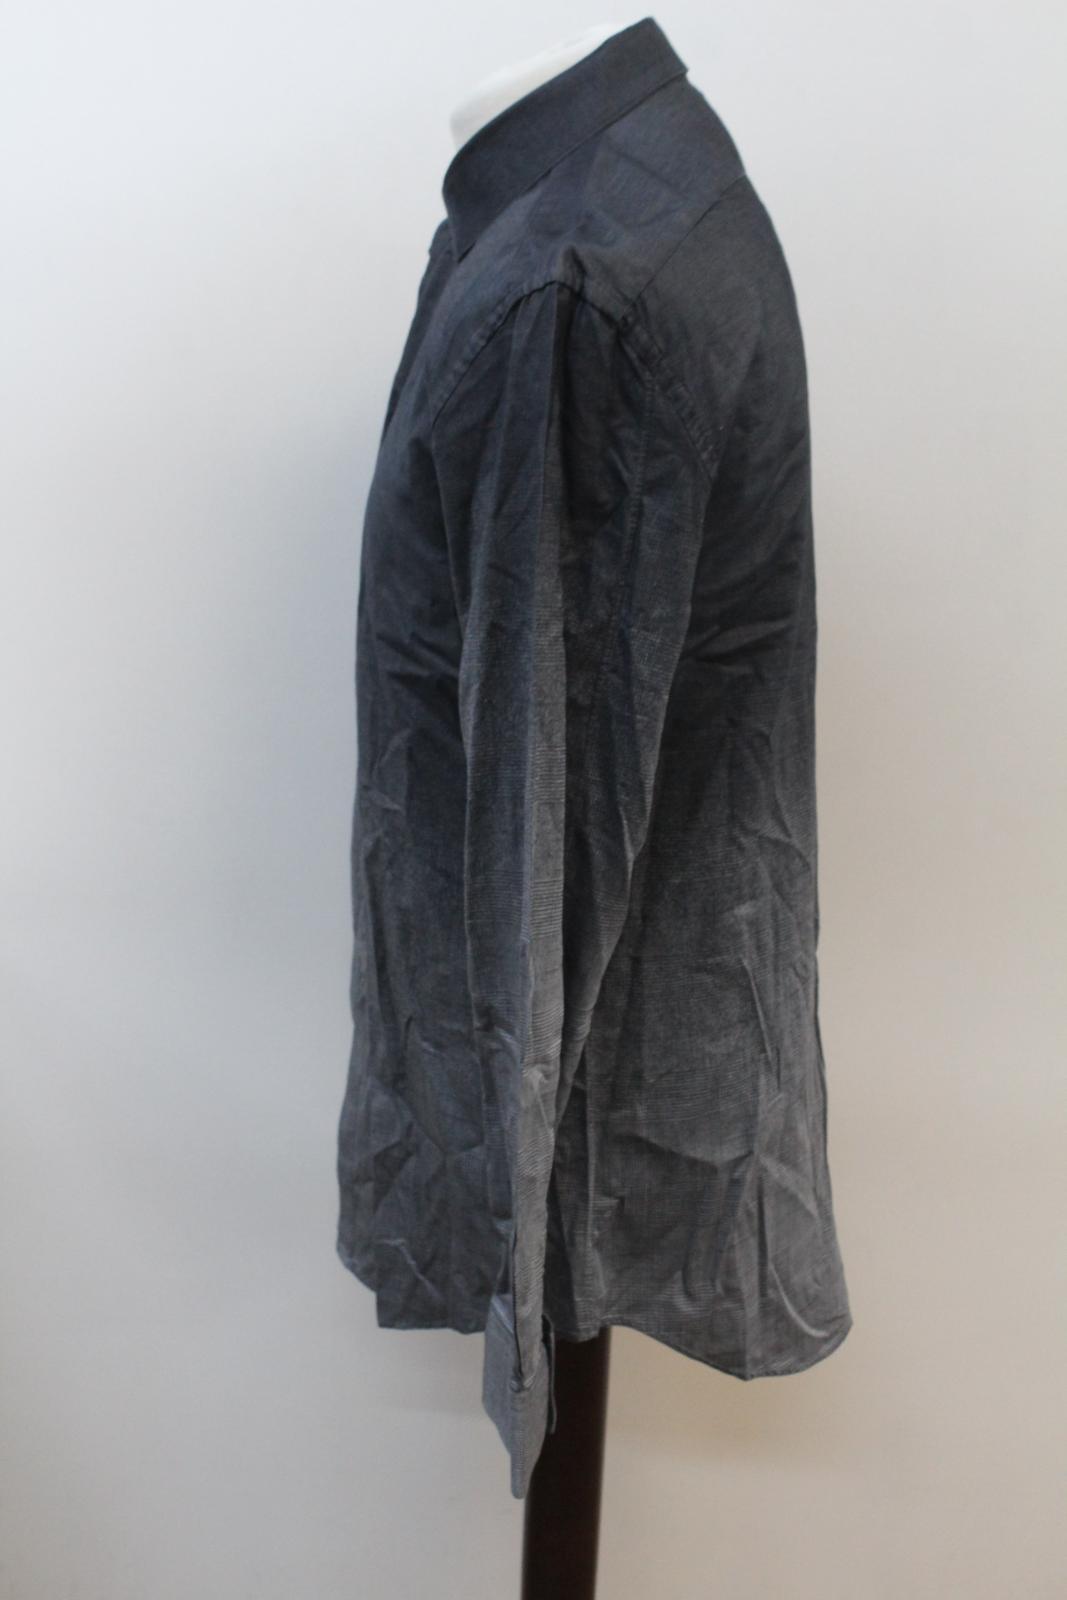 Neil-Barrett-Hombre-Luz-Gris-Oscuro-Algodon-Slim-Fit-Camisa-Cuello-Ombre-16-5-034-42cm miniatura 6